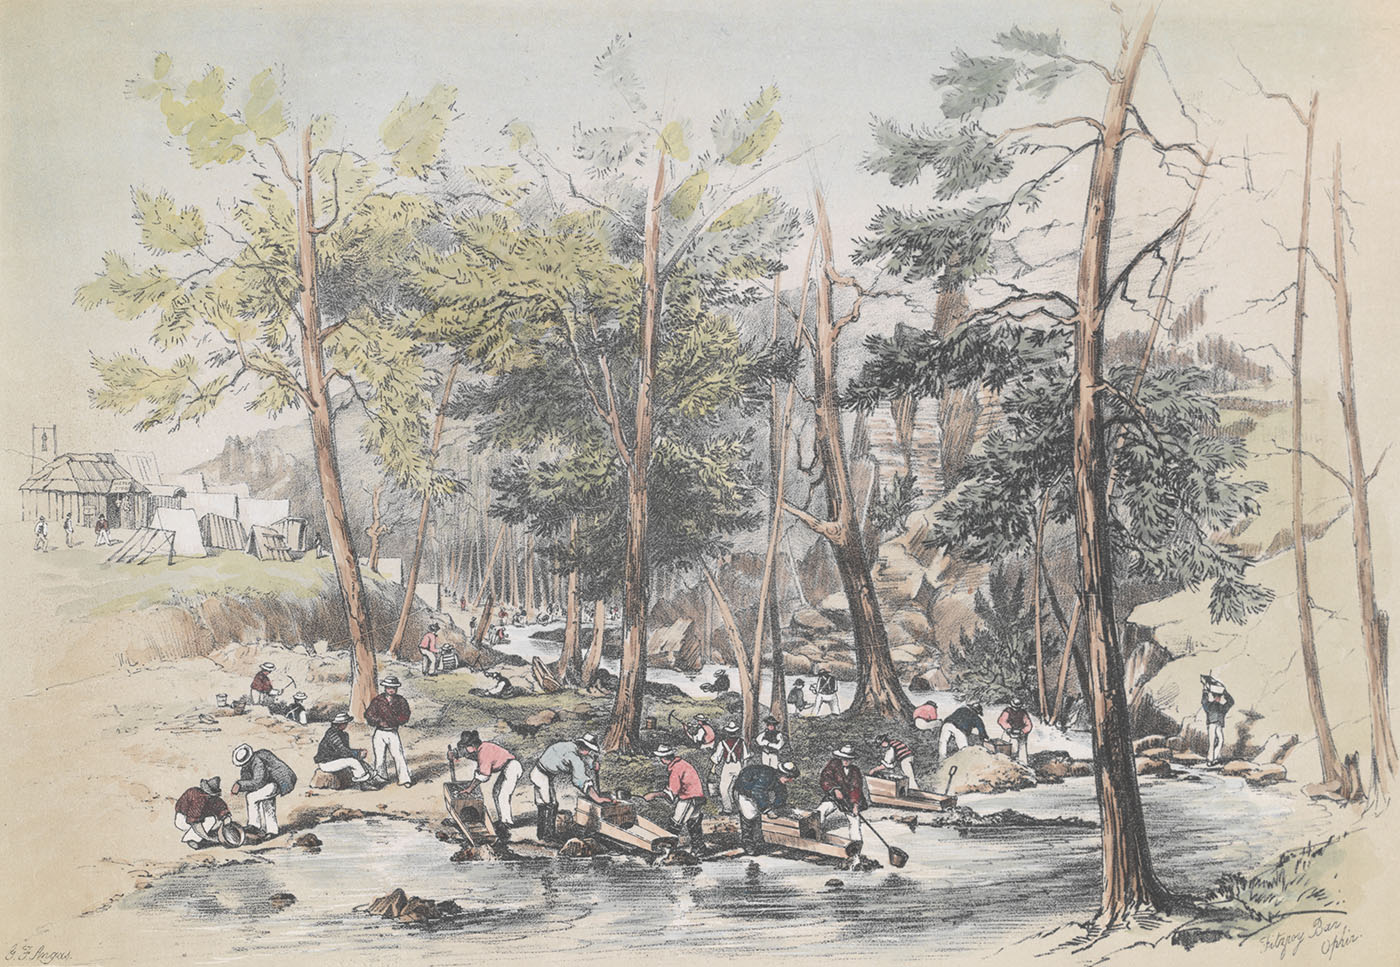 Ophir gold diggings 1851